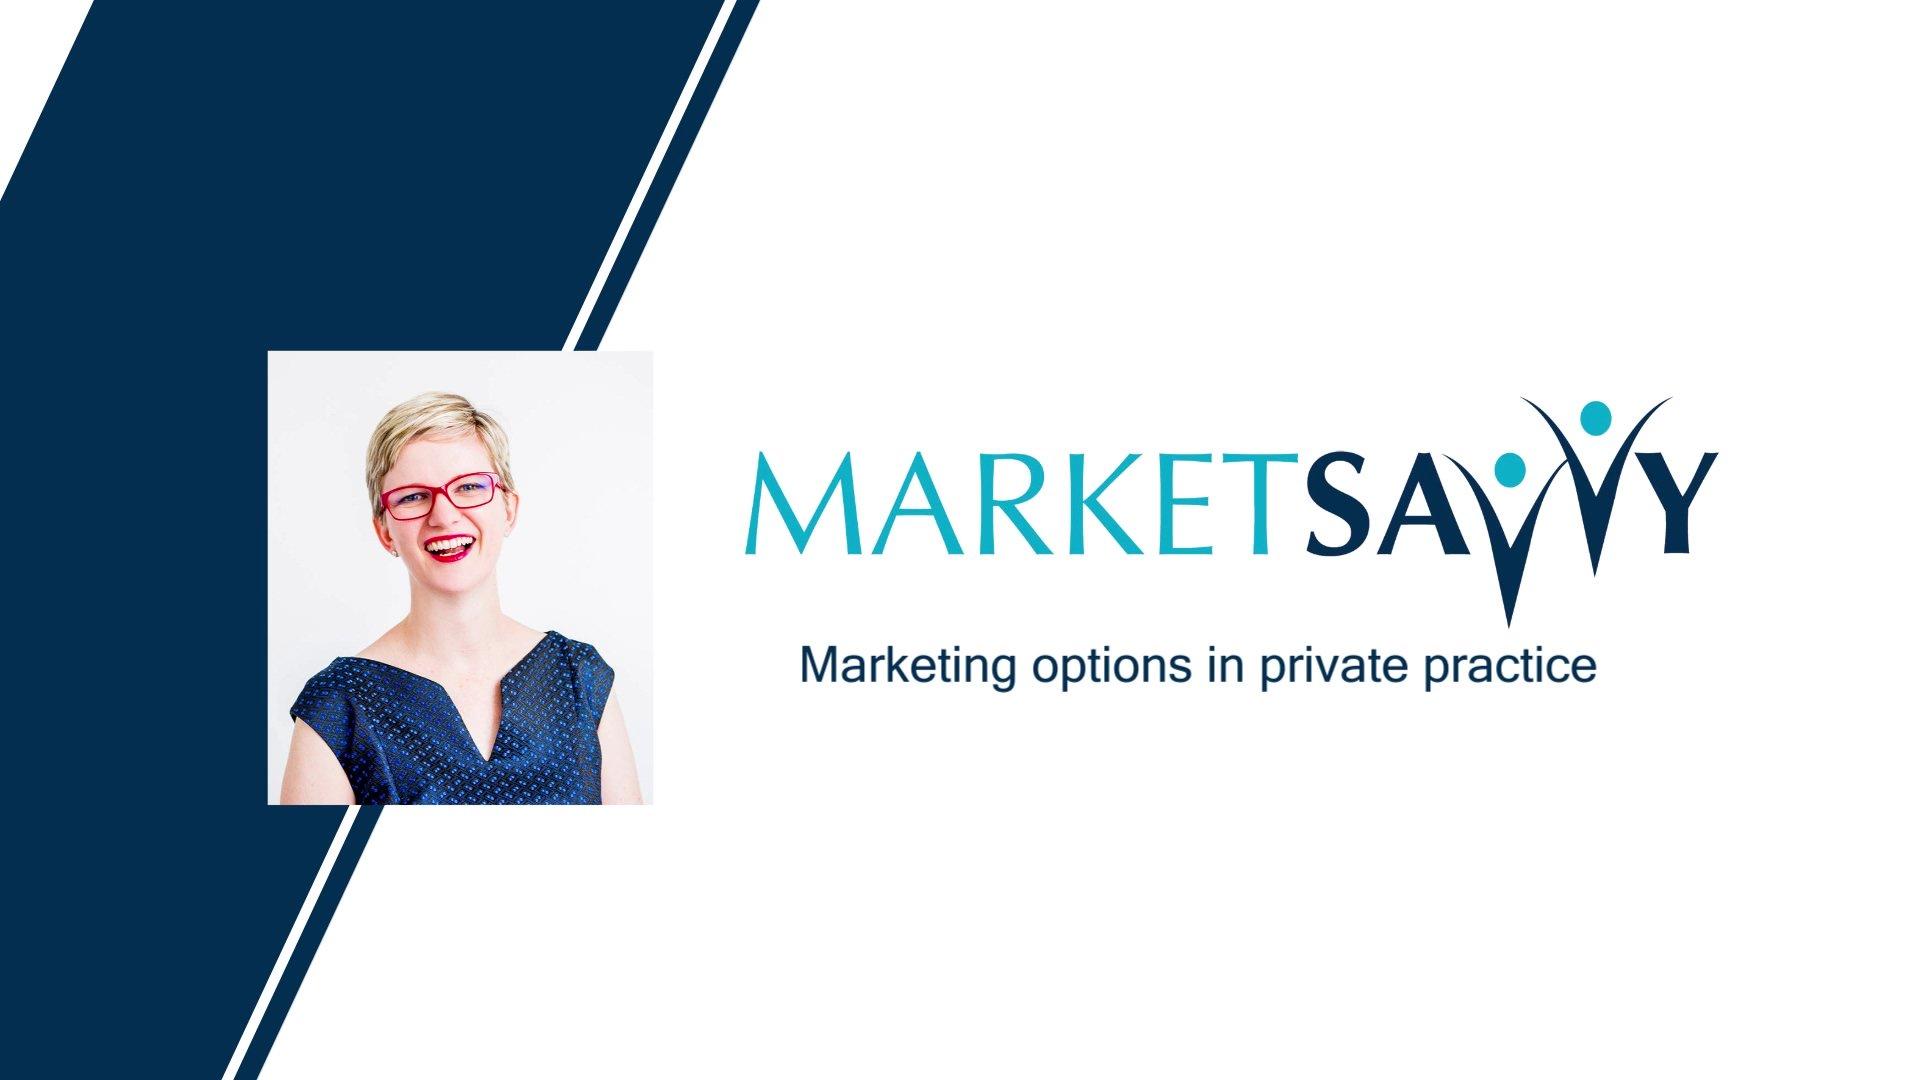 Market Savvy Program 008 - Marketing options in private practice